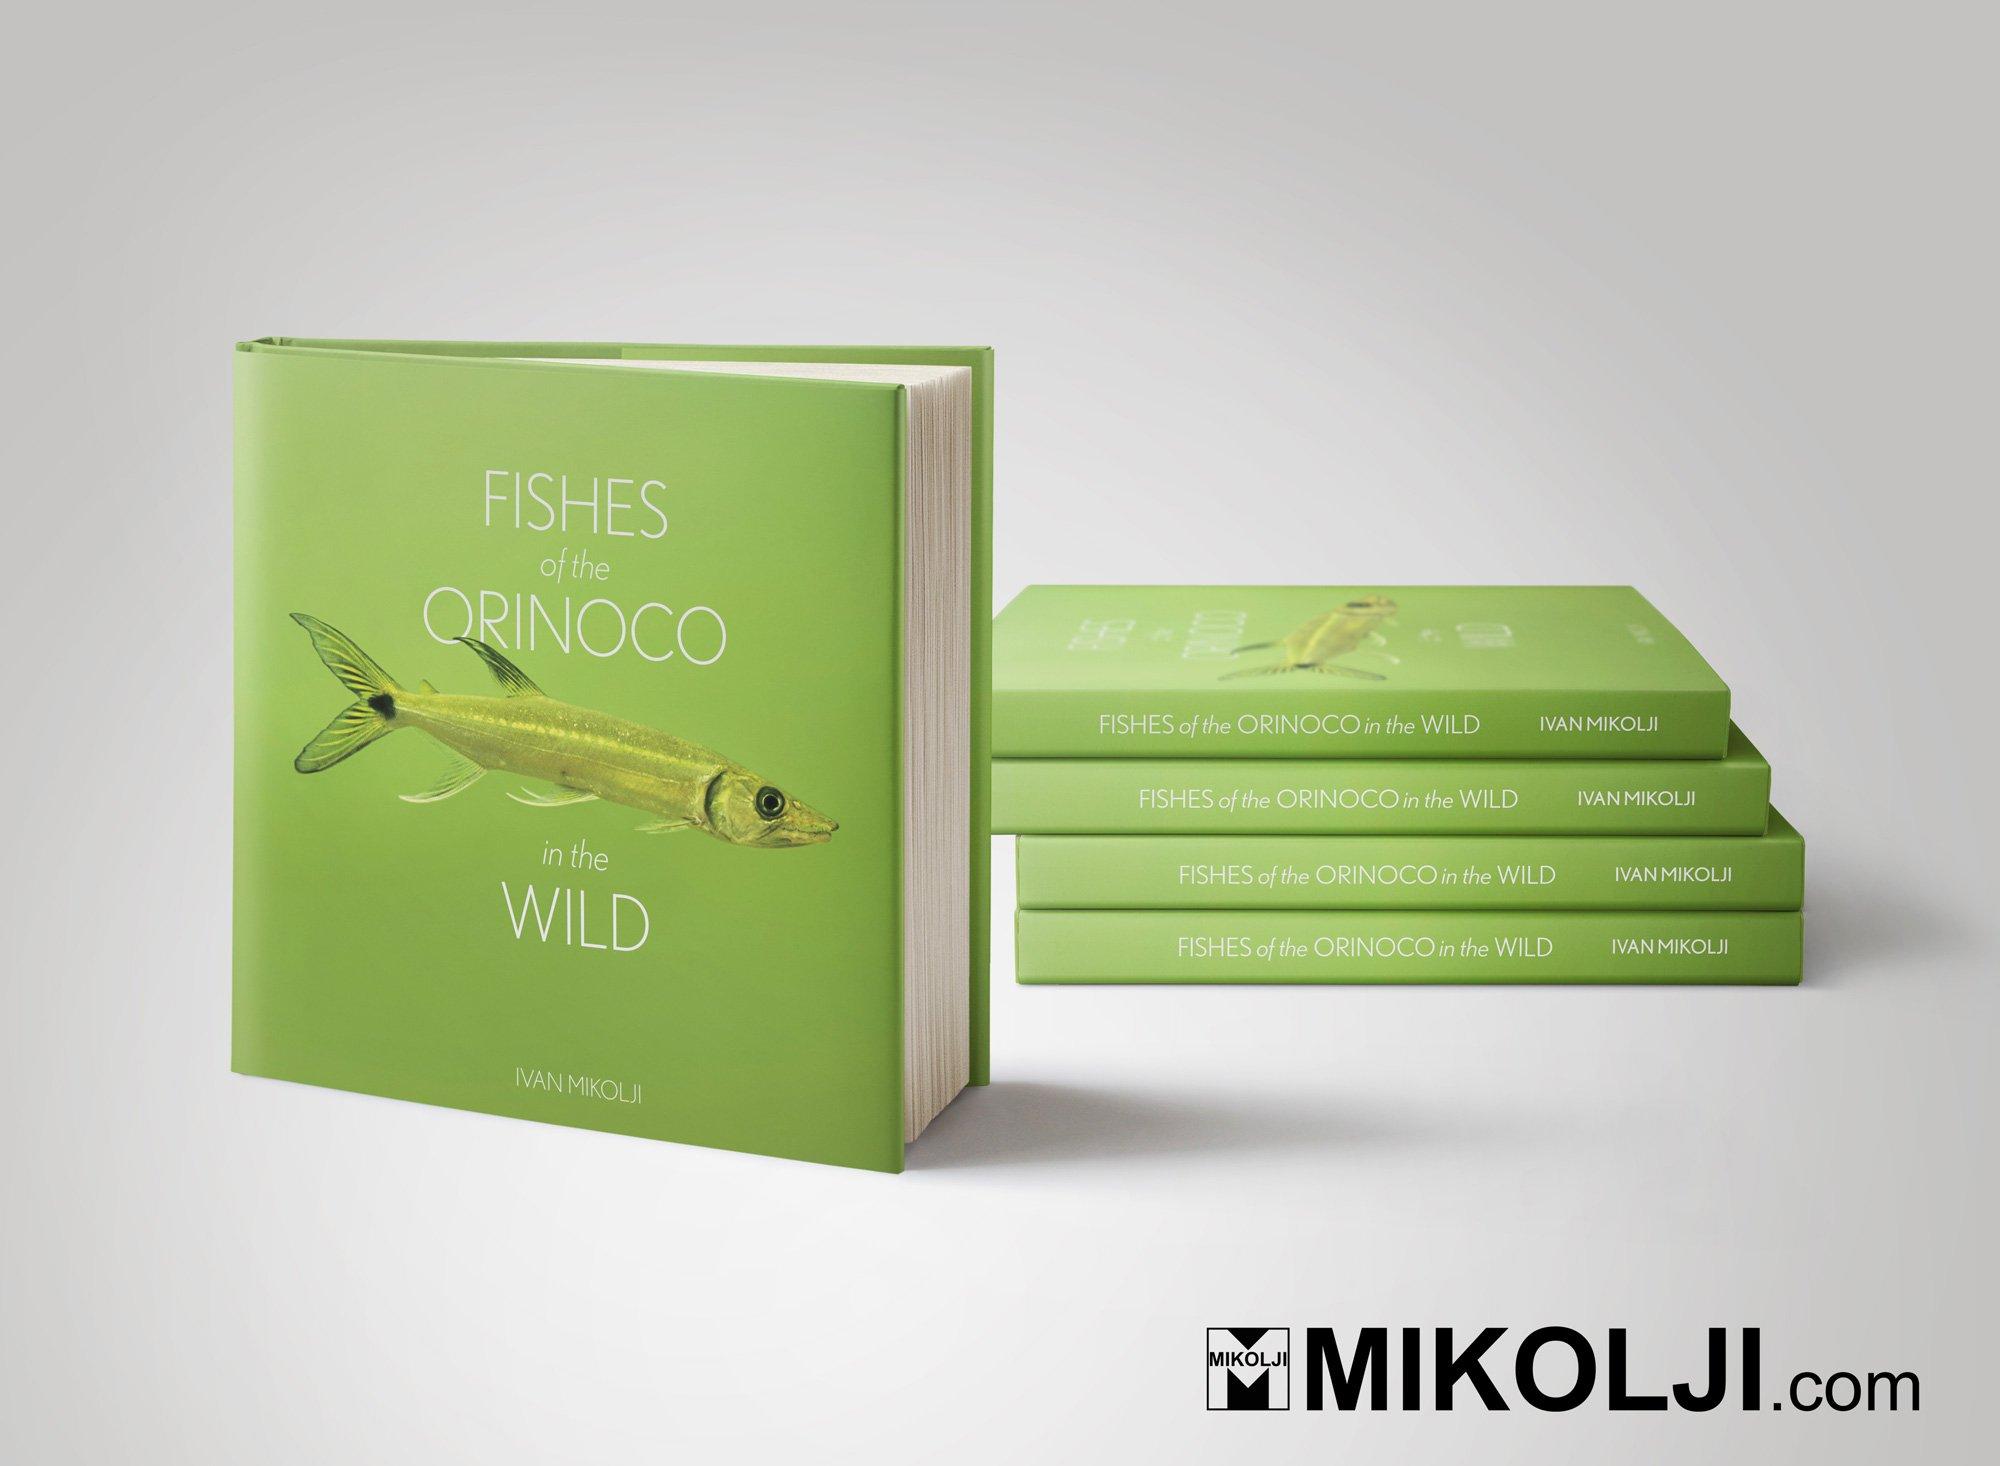 Mikolji's new book is here!